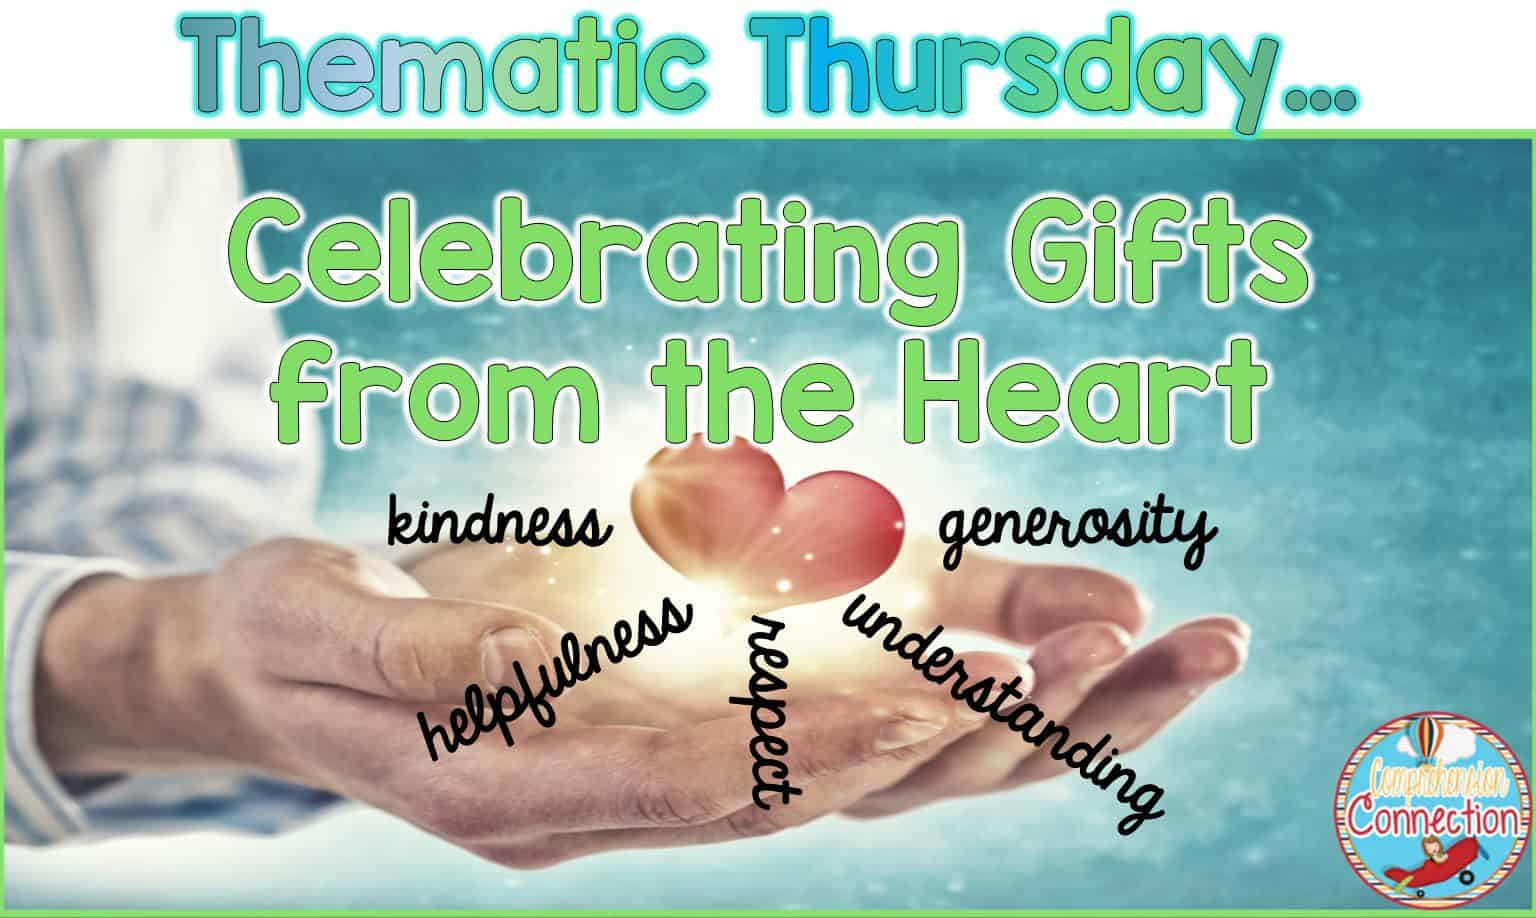 thematic2bthursday2bimage2bfor2b12-10-3276830